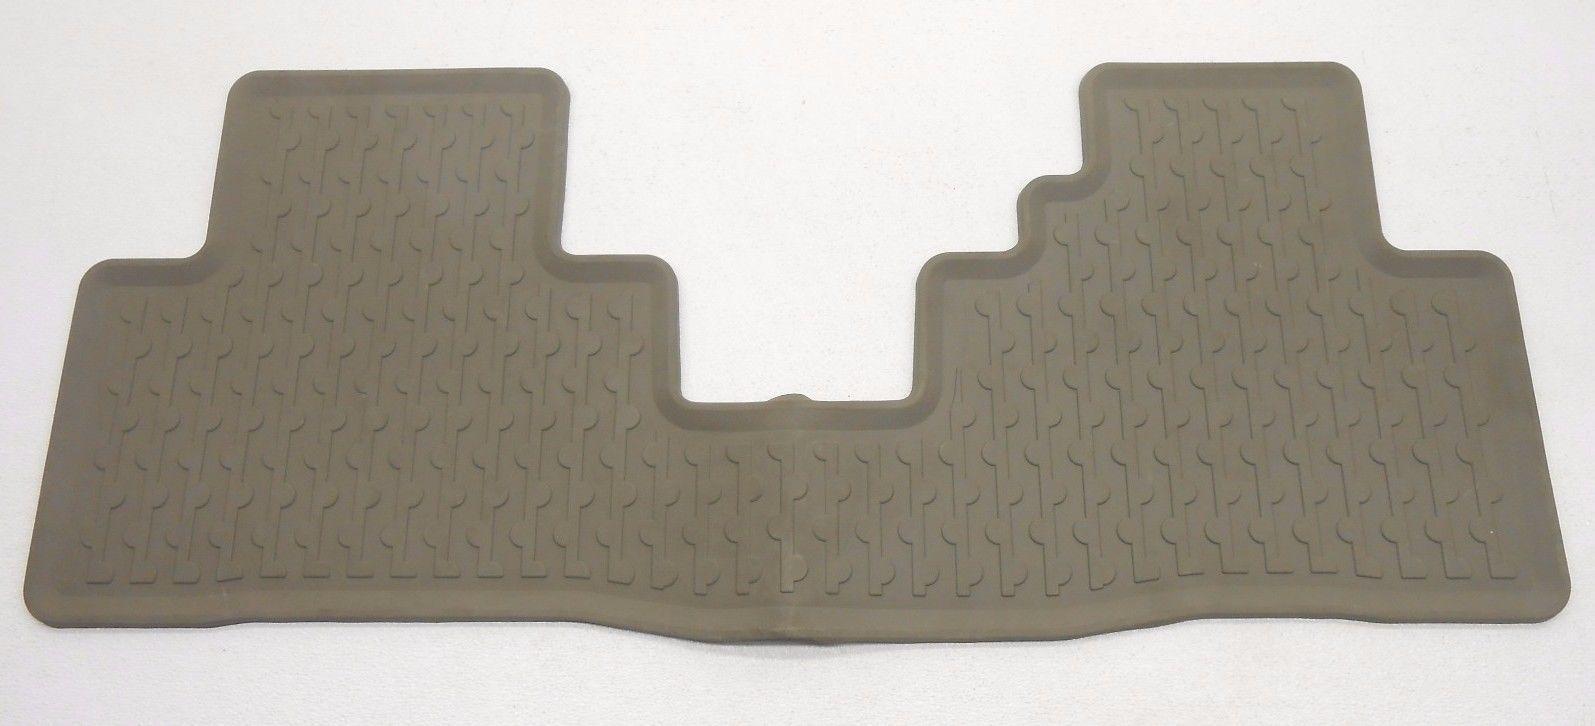 Rubber floor mats acura rdx - Item Title Oem 2007 2008 Acura Rdx 2nd Row Rubber Floor Mat